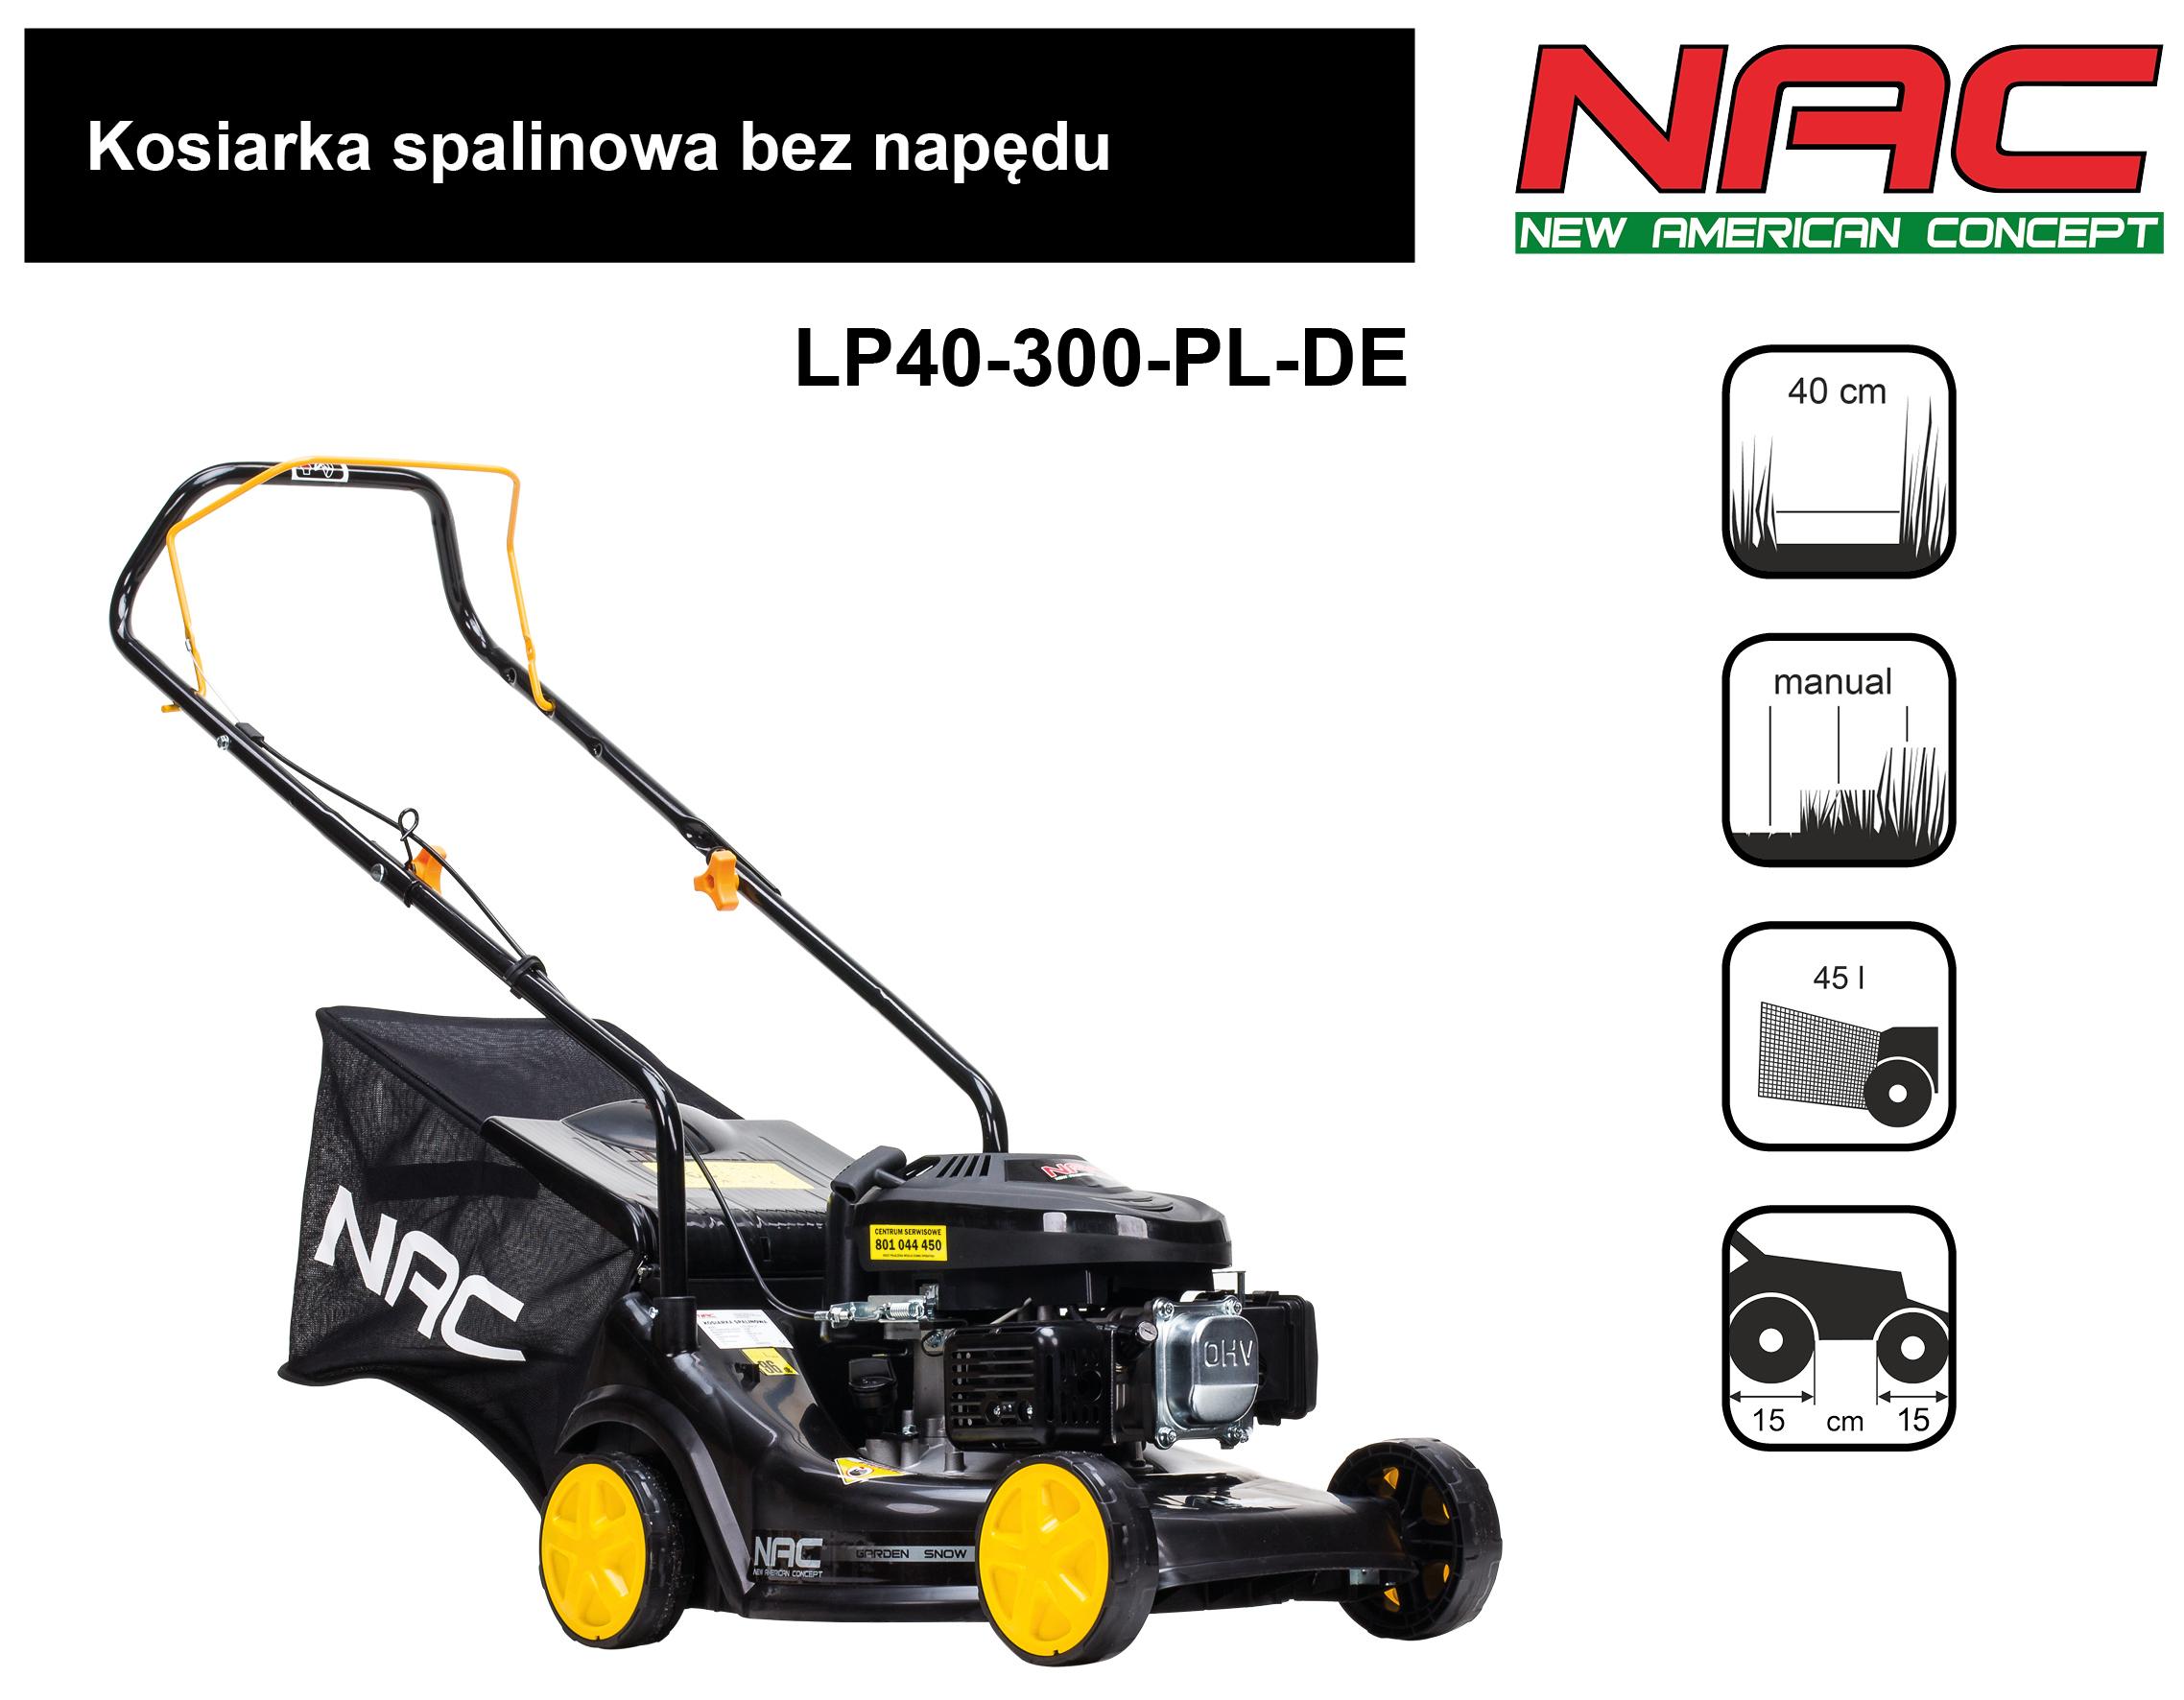 NAC Kosiarka spalinowa LP40-300-PL-DE